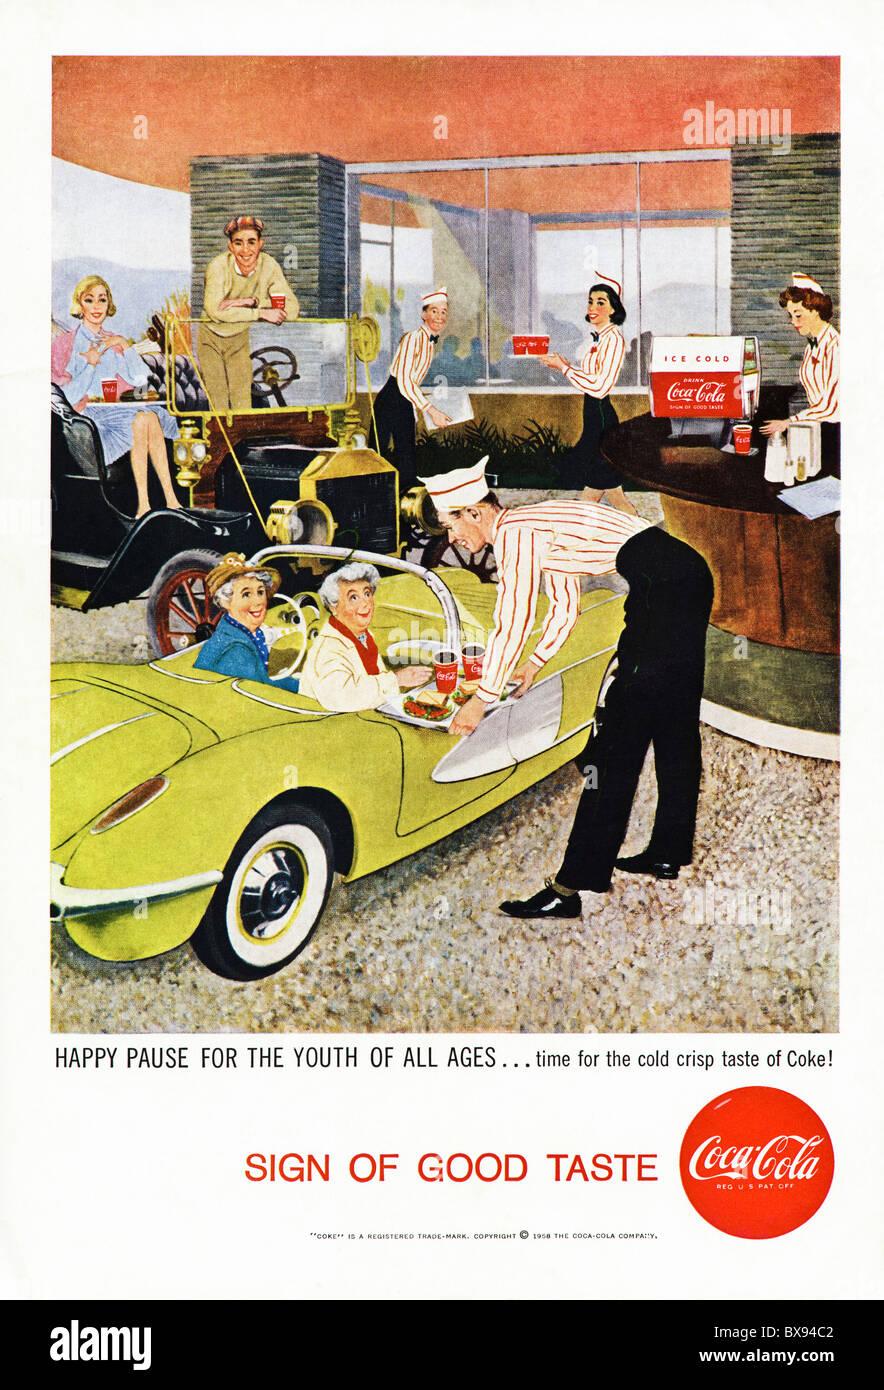 Classic Coca Cola colour advert featuring illustration drive through scene with elderly ladies in American magazine - Stock Image